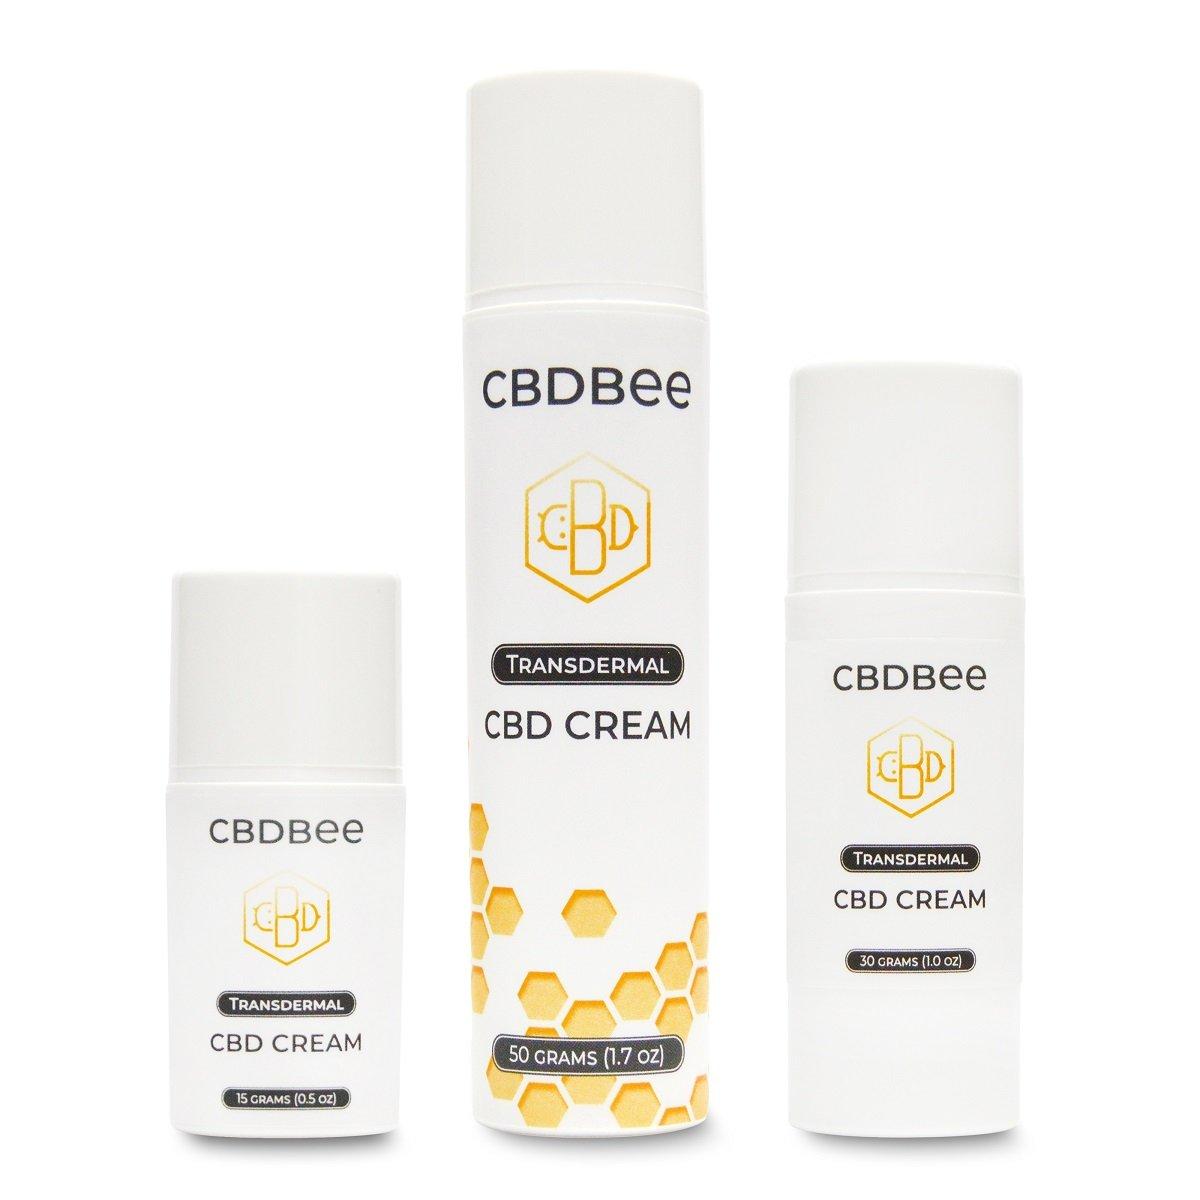 Transdermal CBD Cream